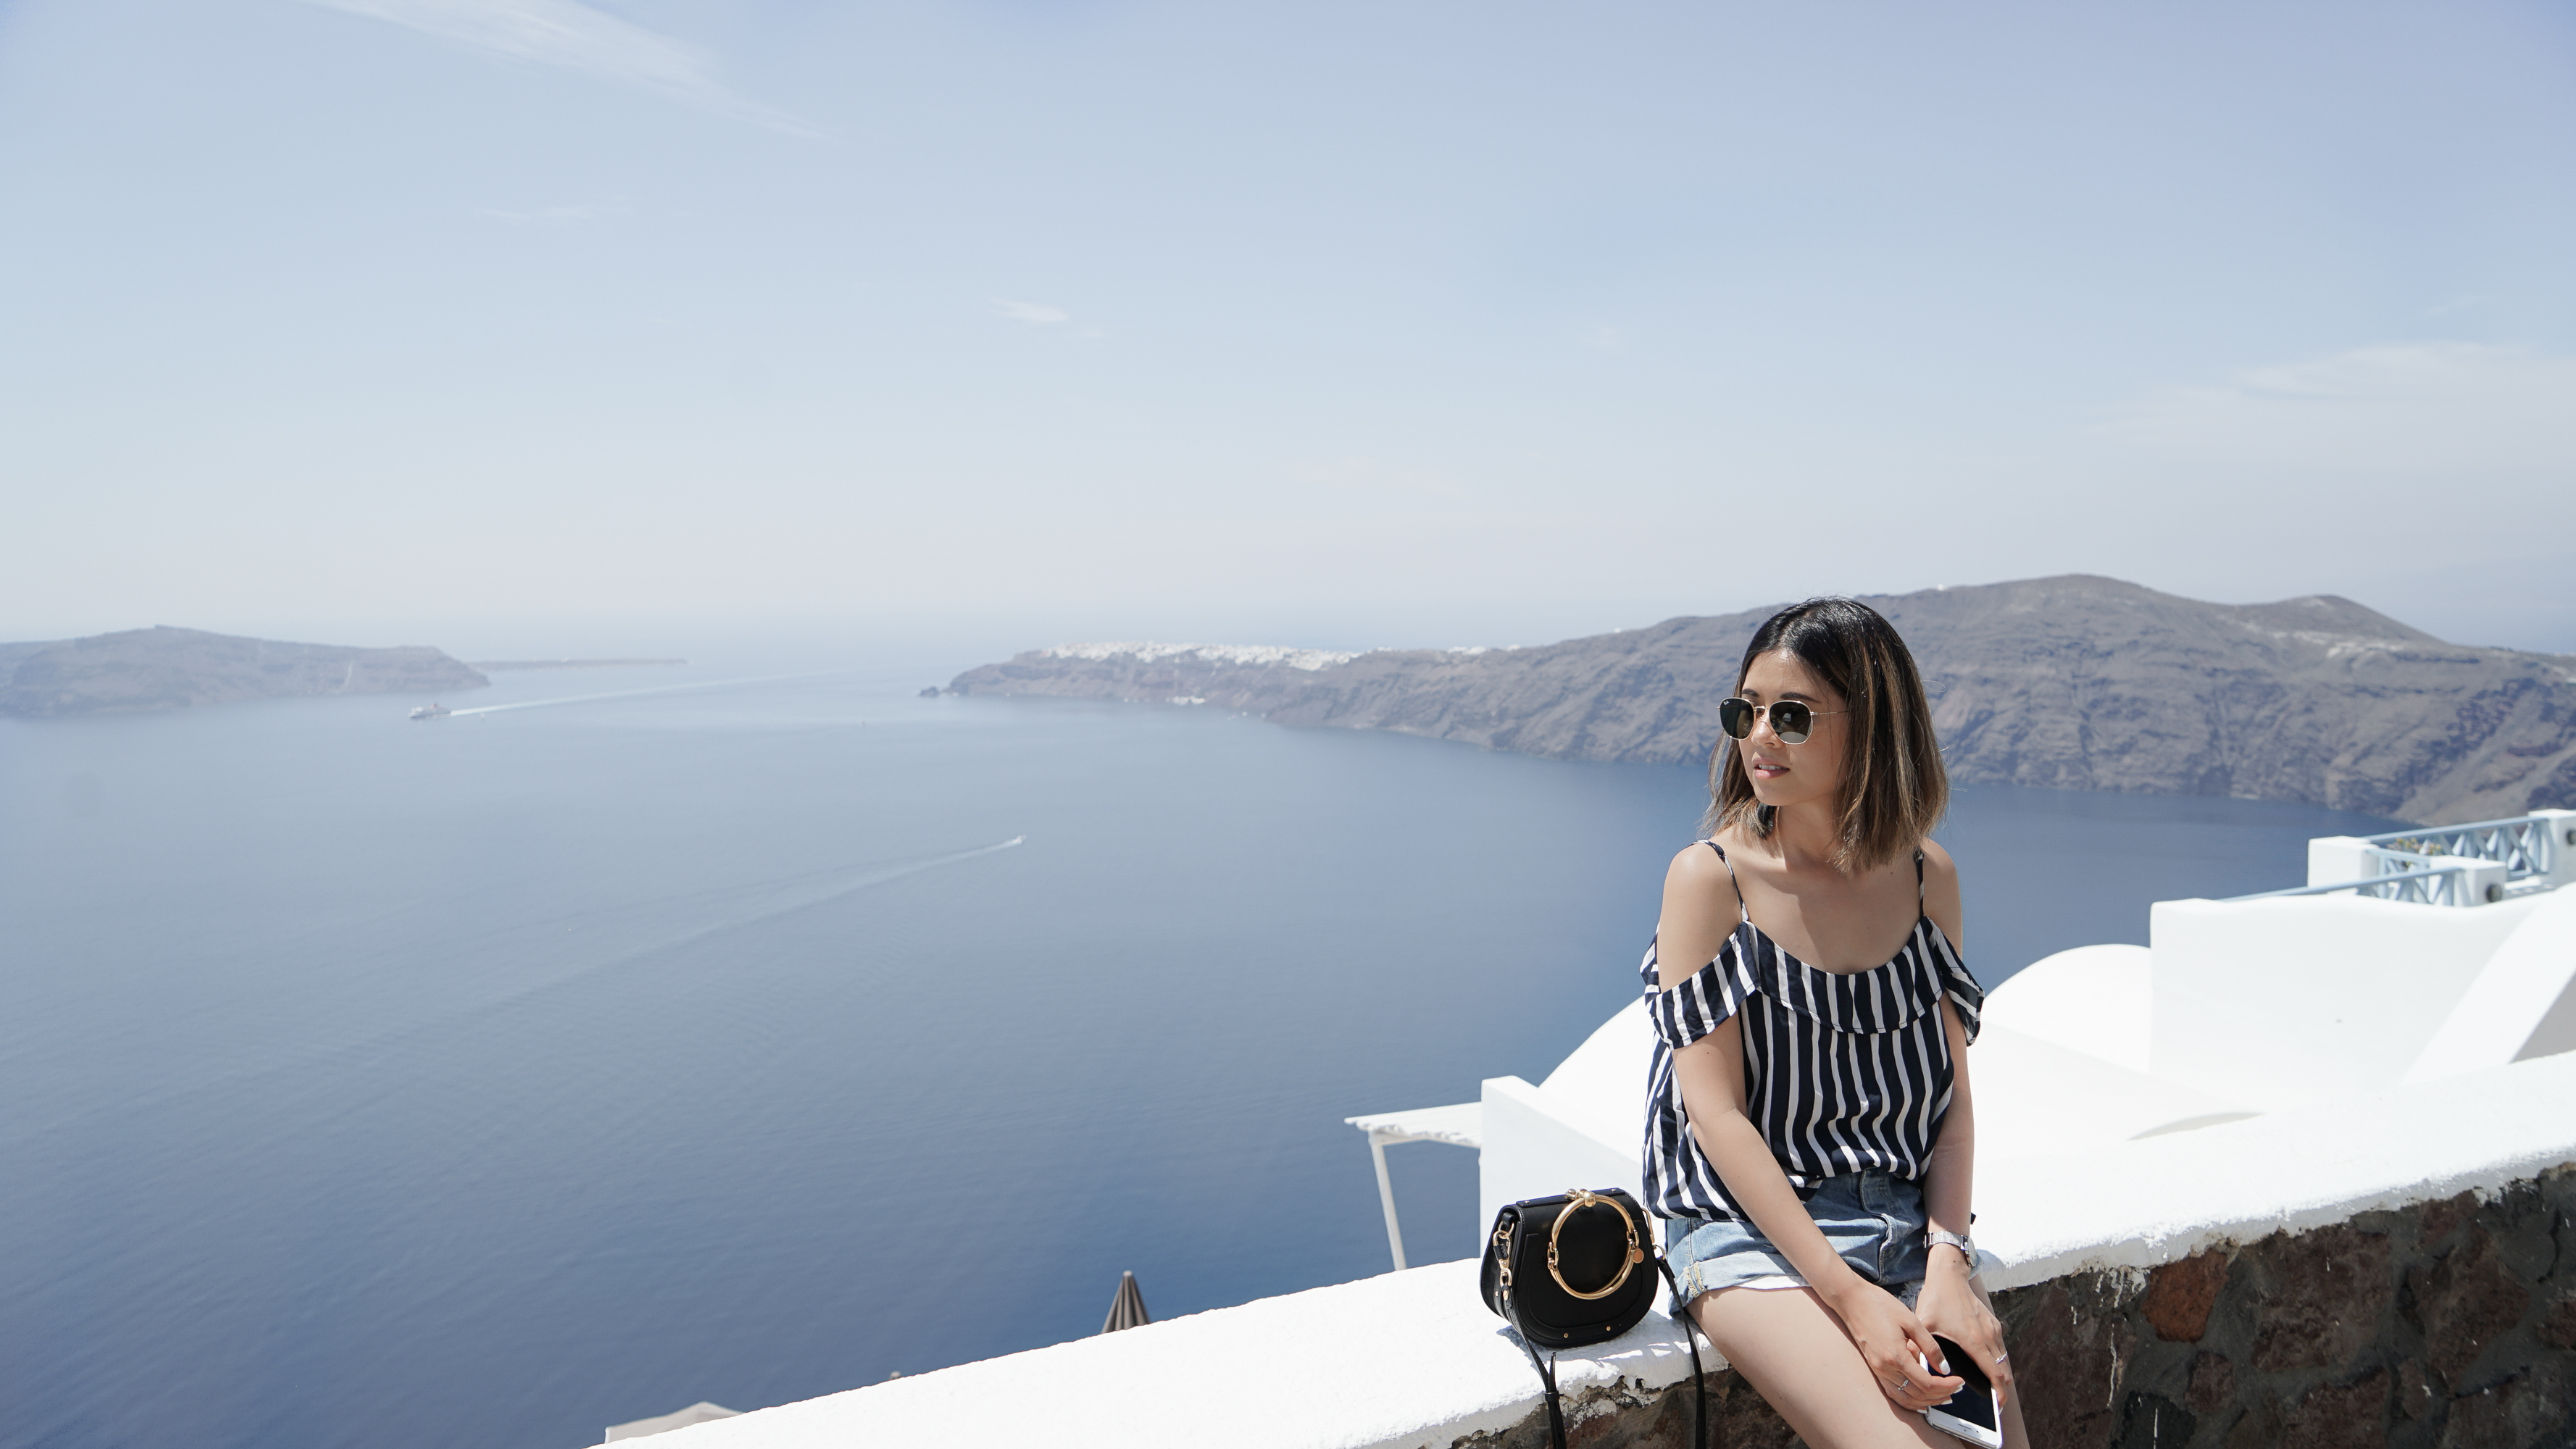 Santorini review, Santorini travel diaries, Santorini blog, Oia review, Pezoules review